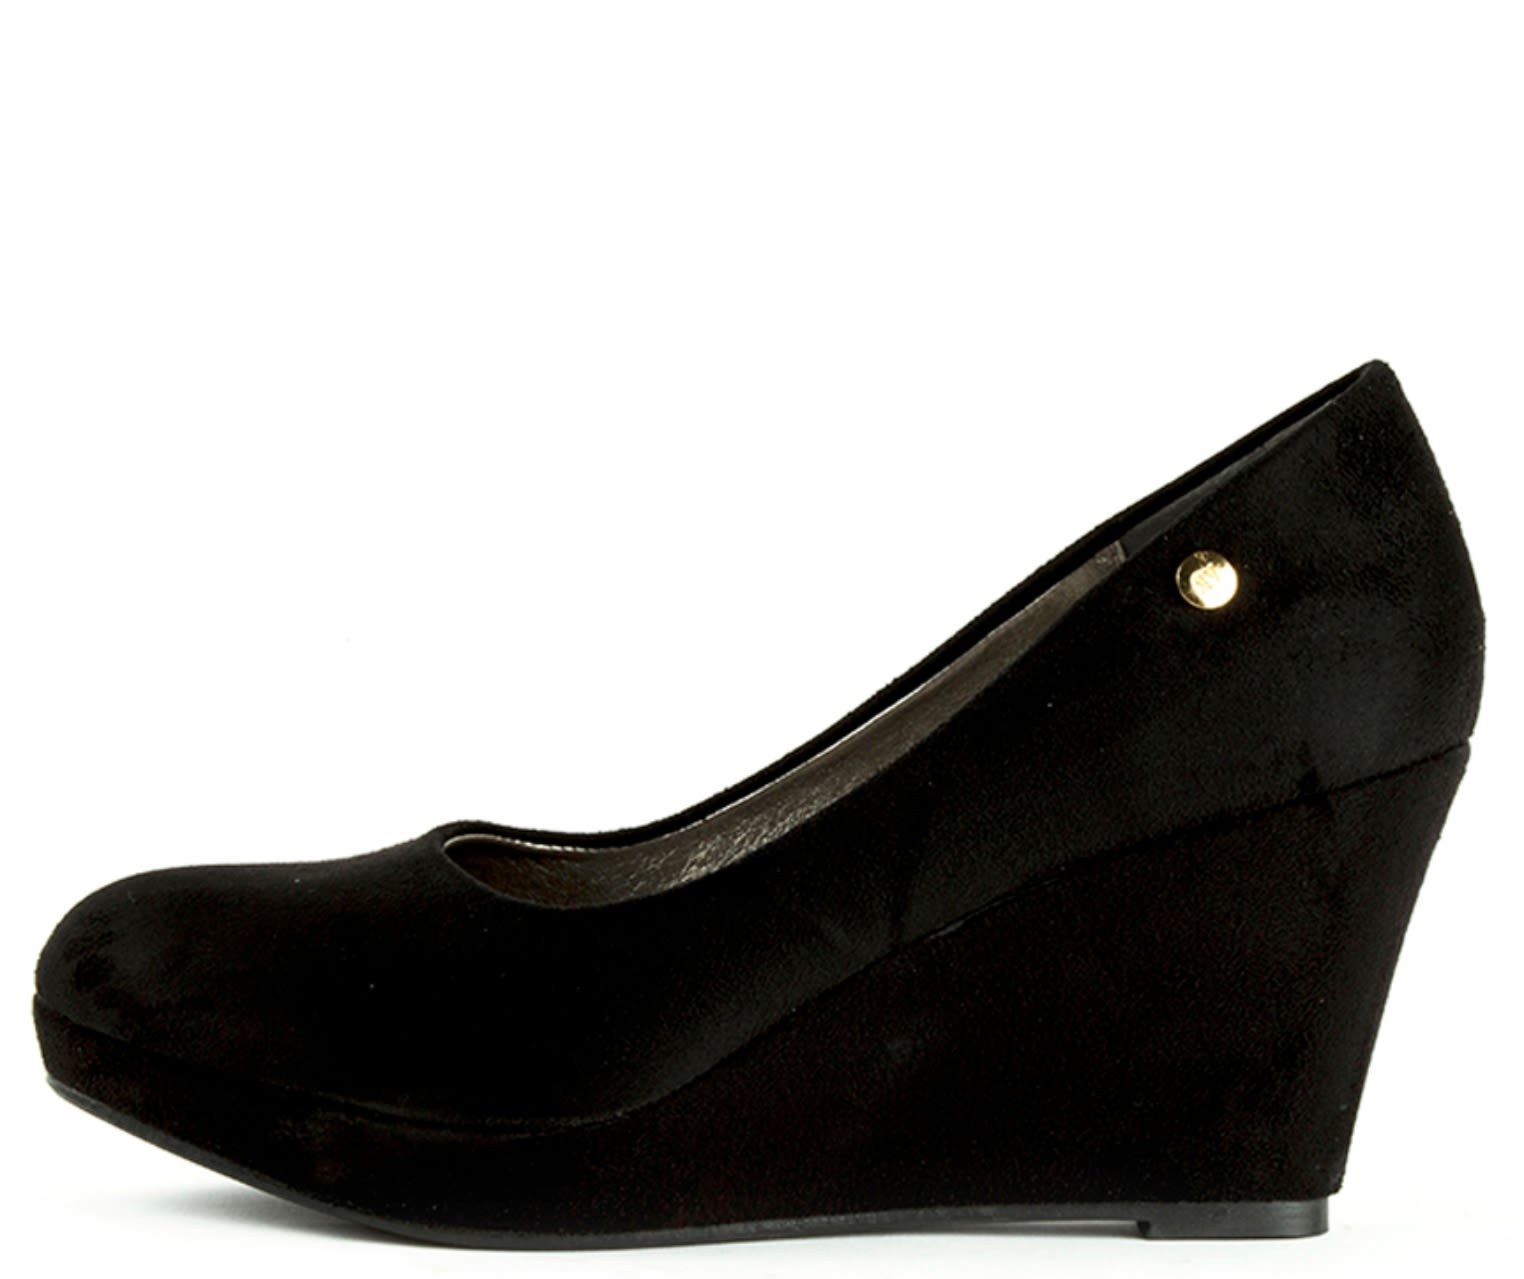 Zapato de Vestir Negro BF901-1